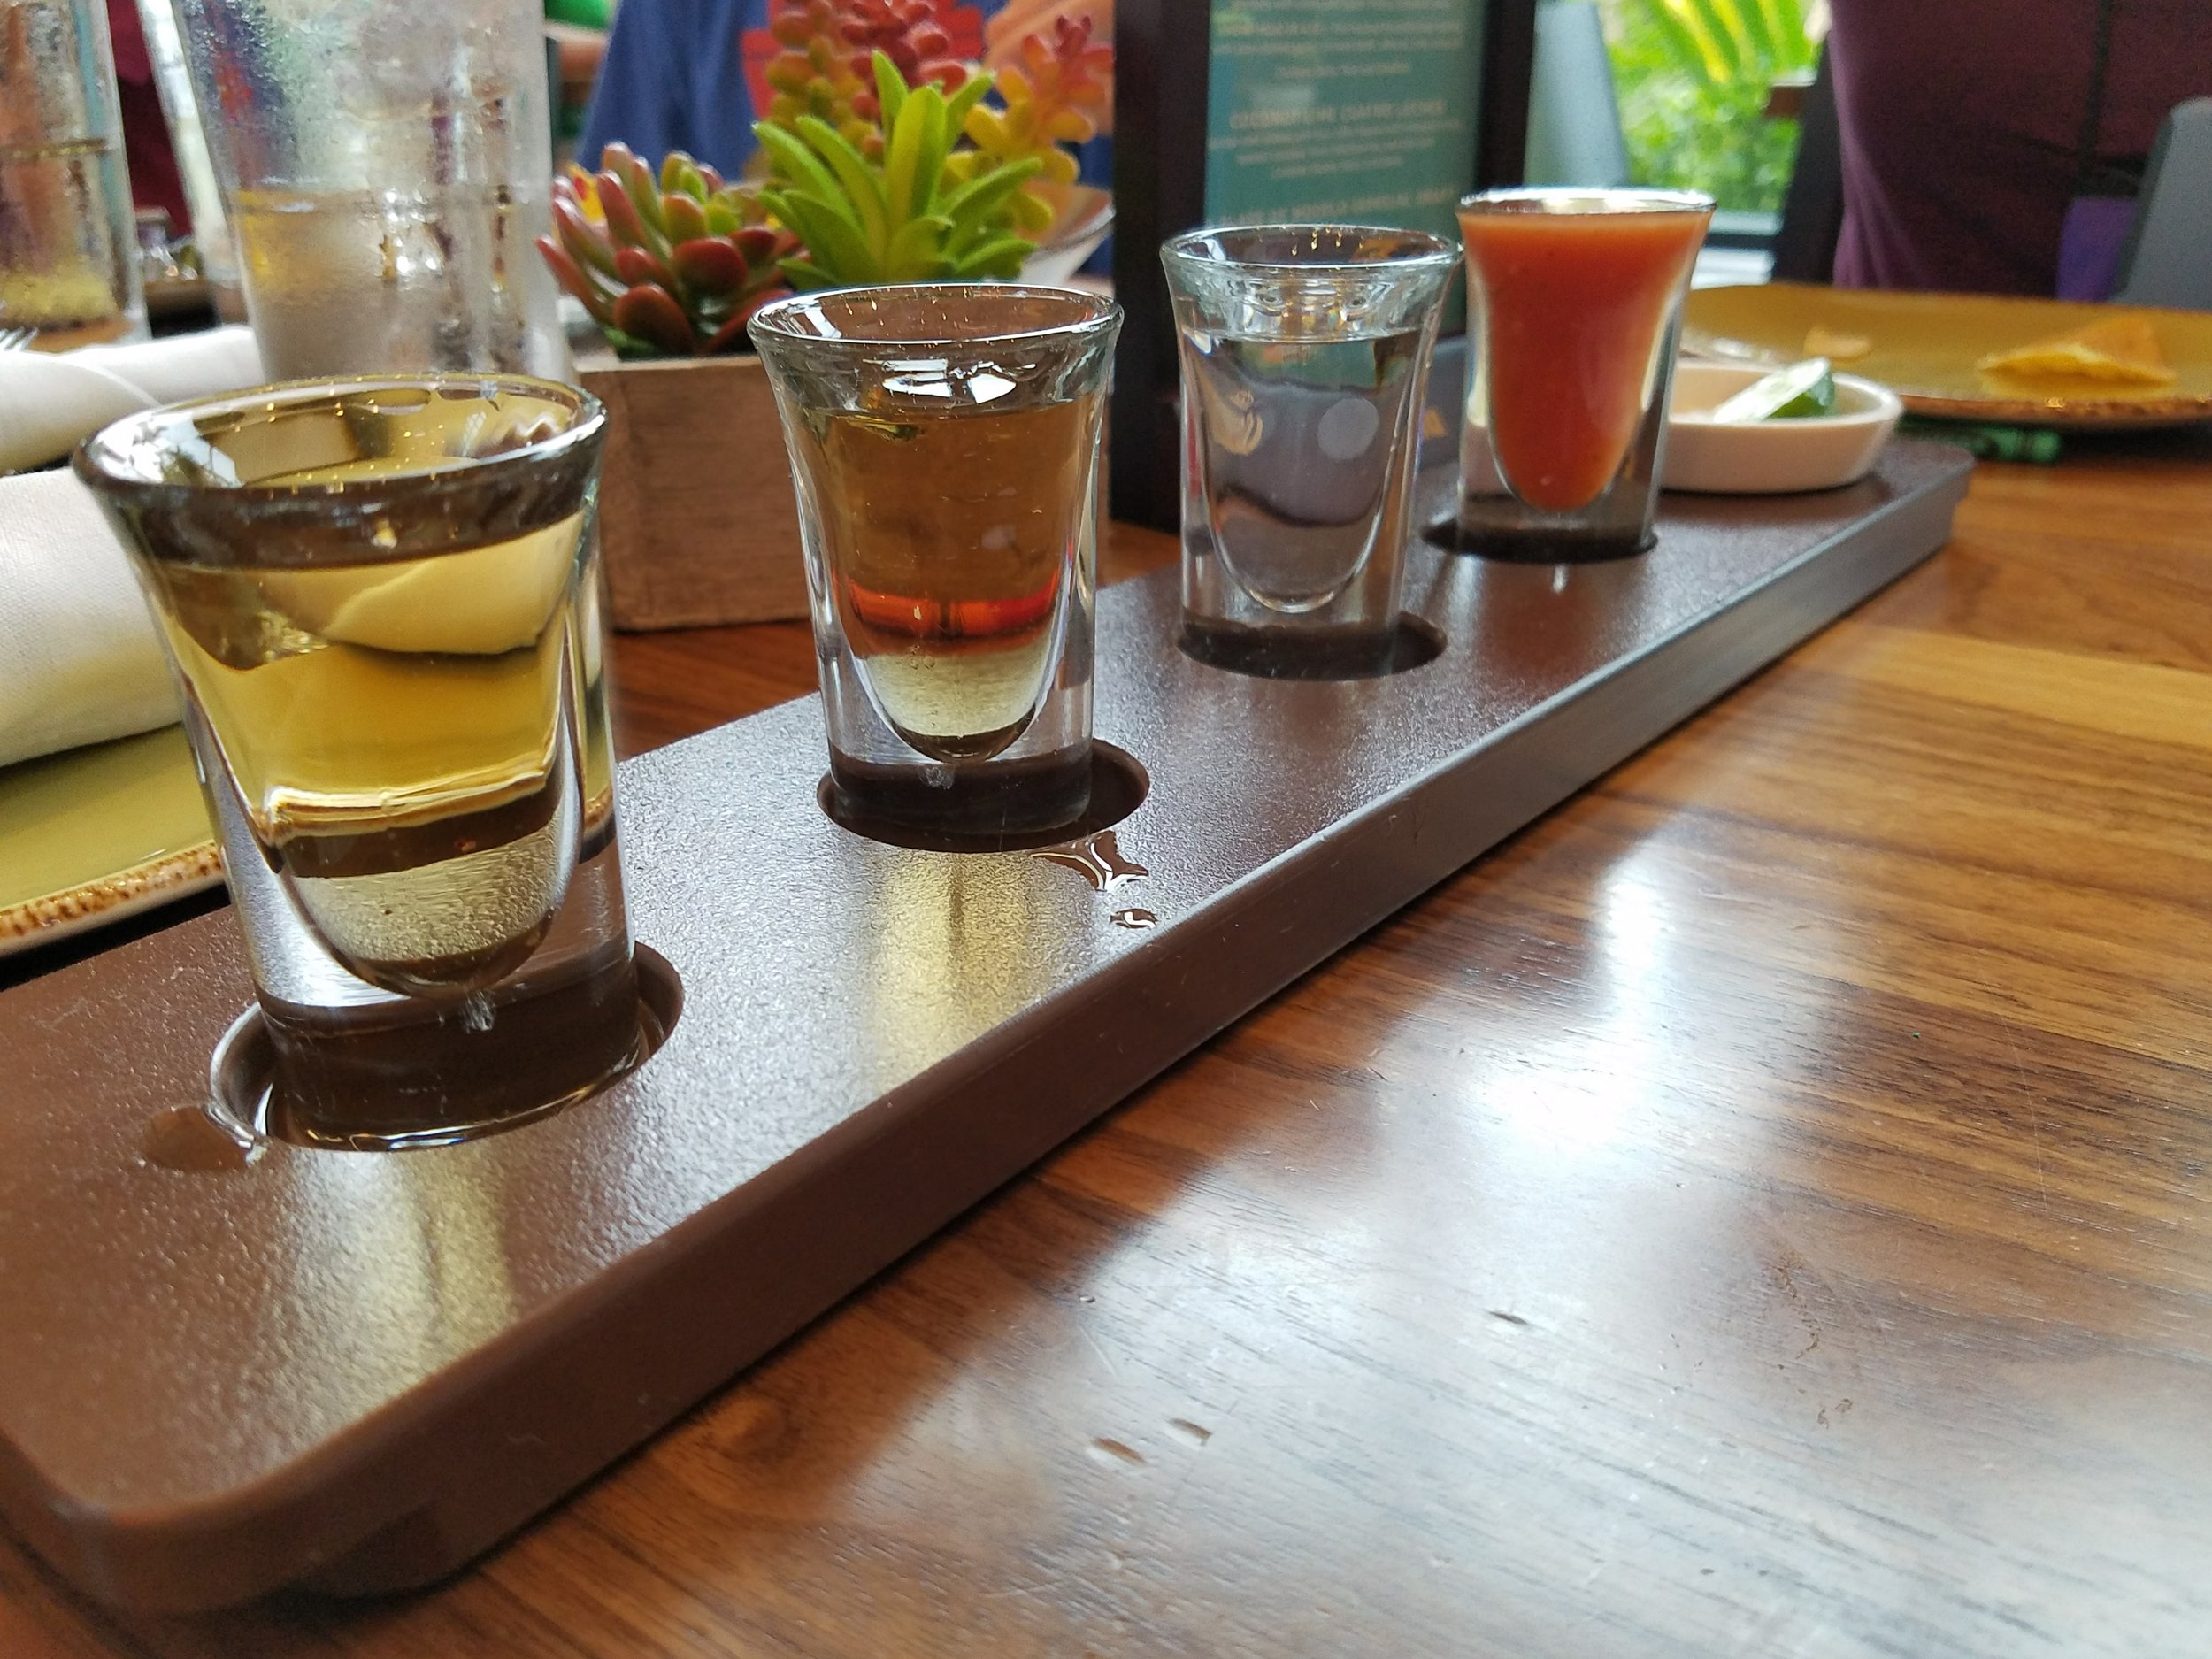 Premium Tequila Flight (L-R):Avión Reserva 44 Extra Añejo, Clase Azul Reposado, Casa Dragones Blanco. Tomato juice, lime, and salt included.